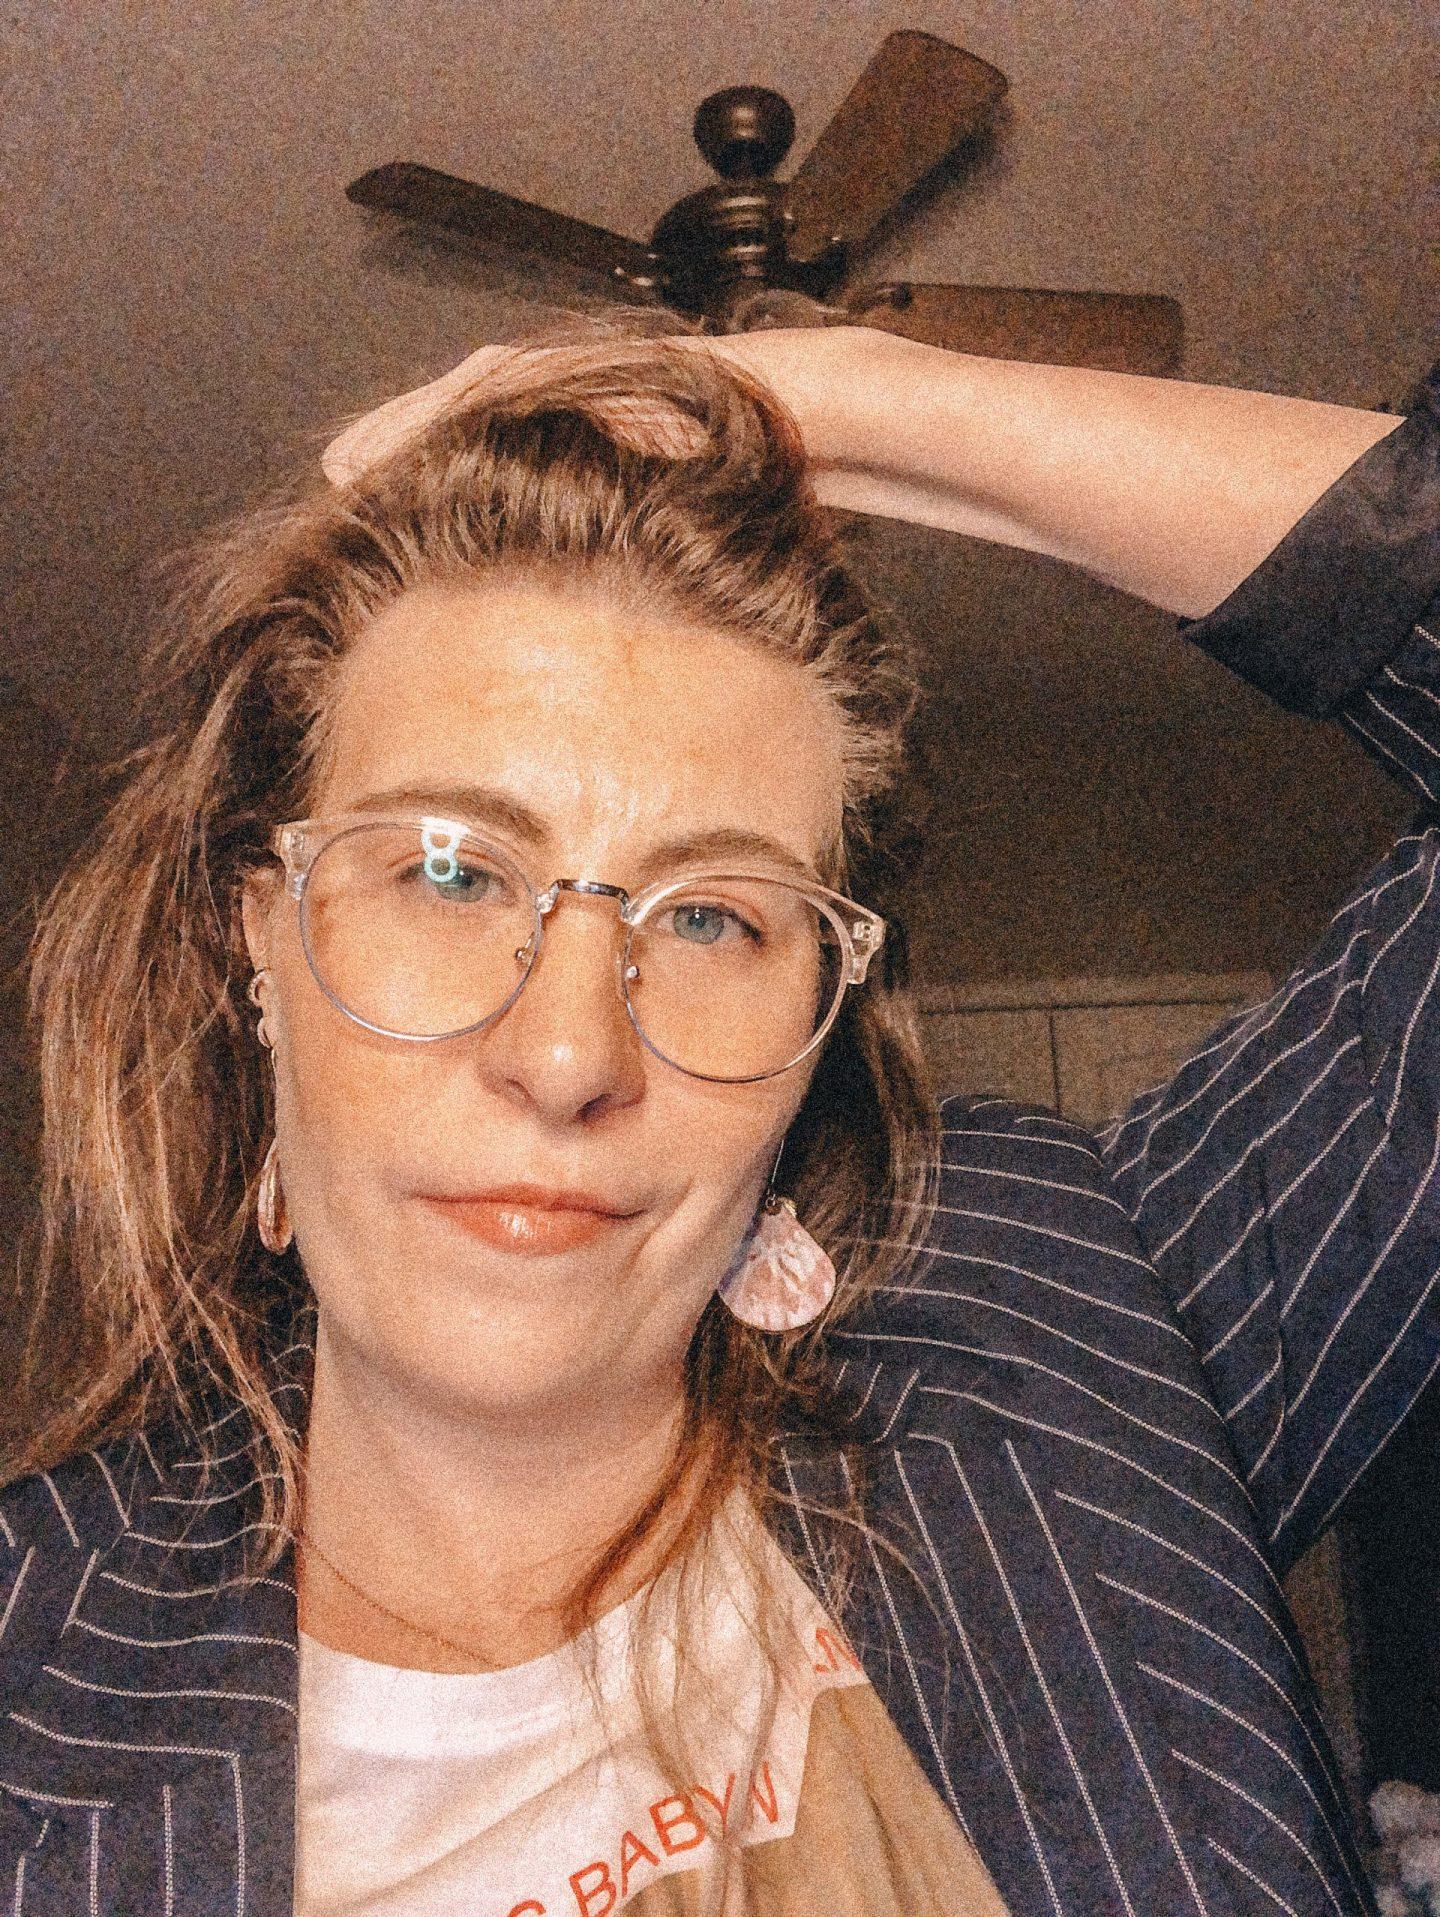 Selfie of a woman